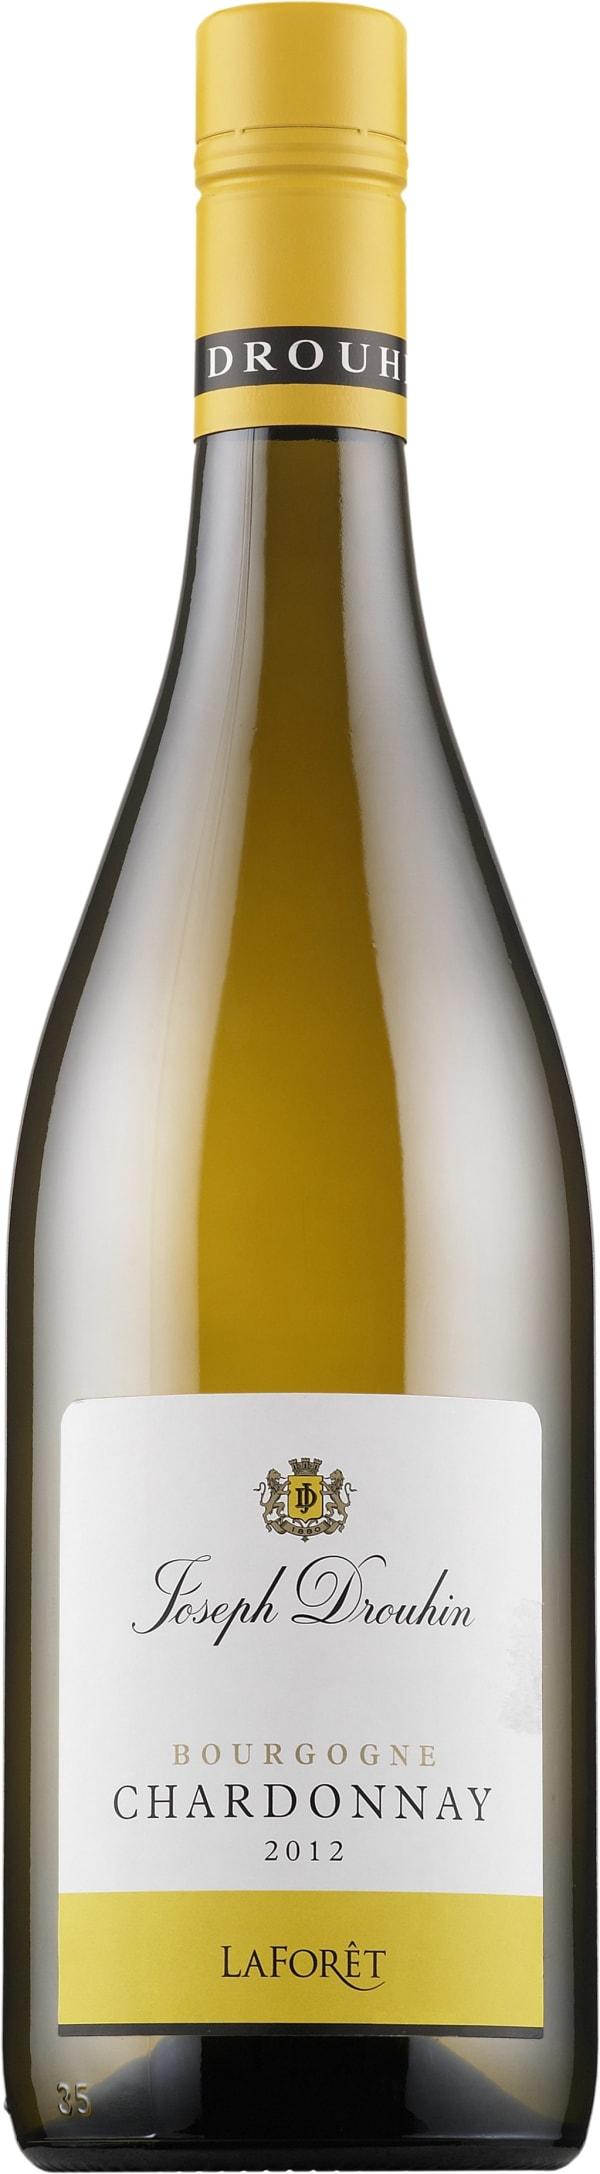 Joseph Drouhin Laforet Chardonnay 2015